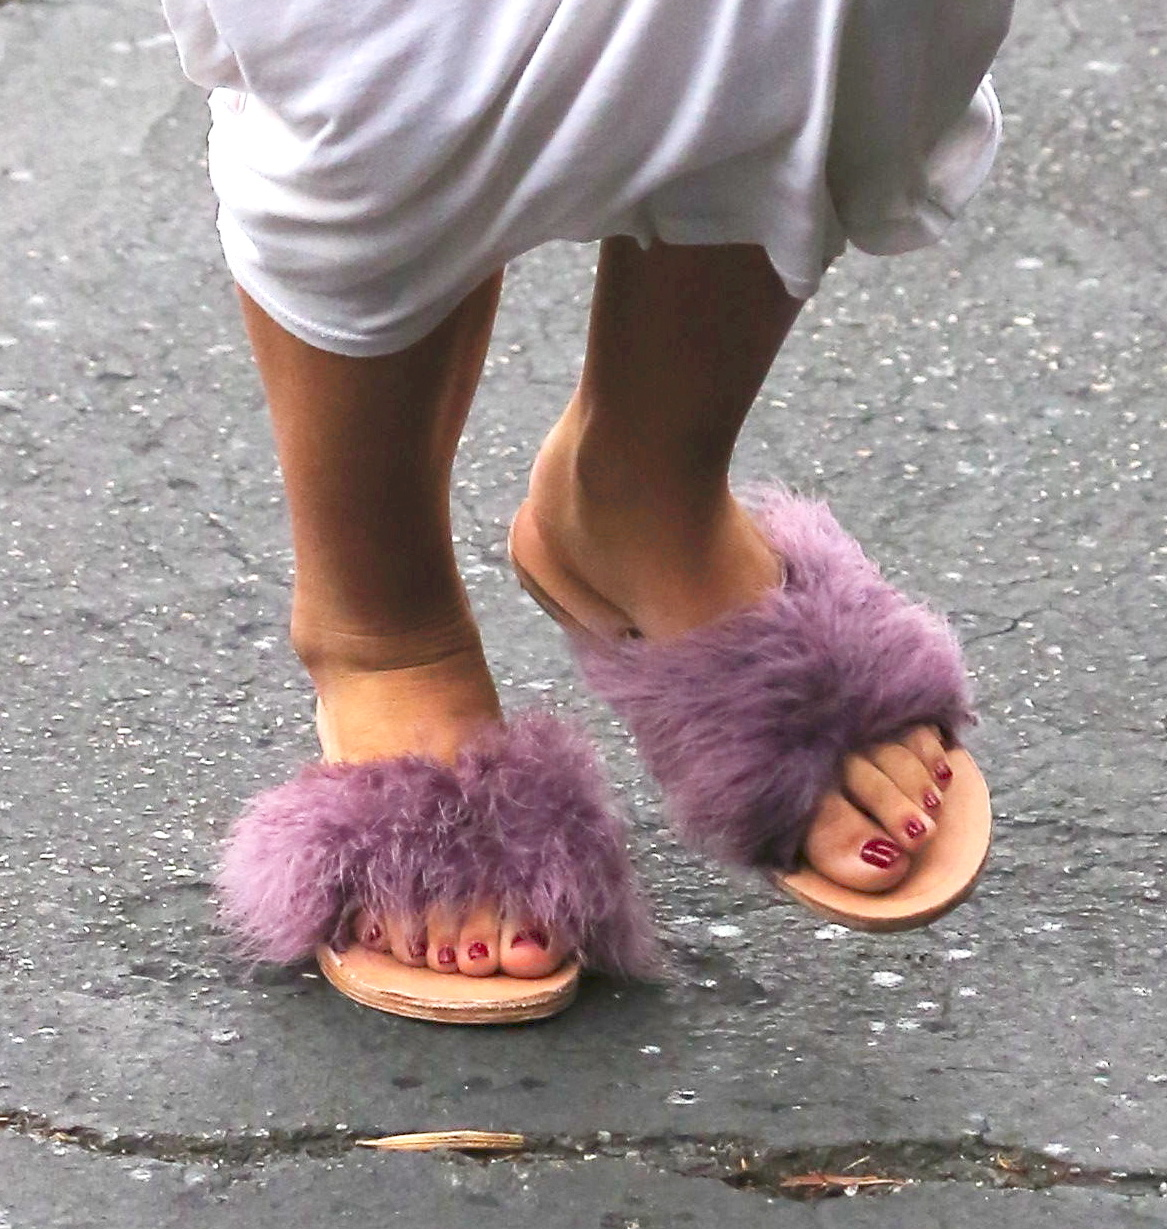 Sofia Richie's Feet